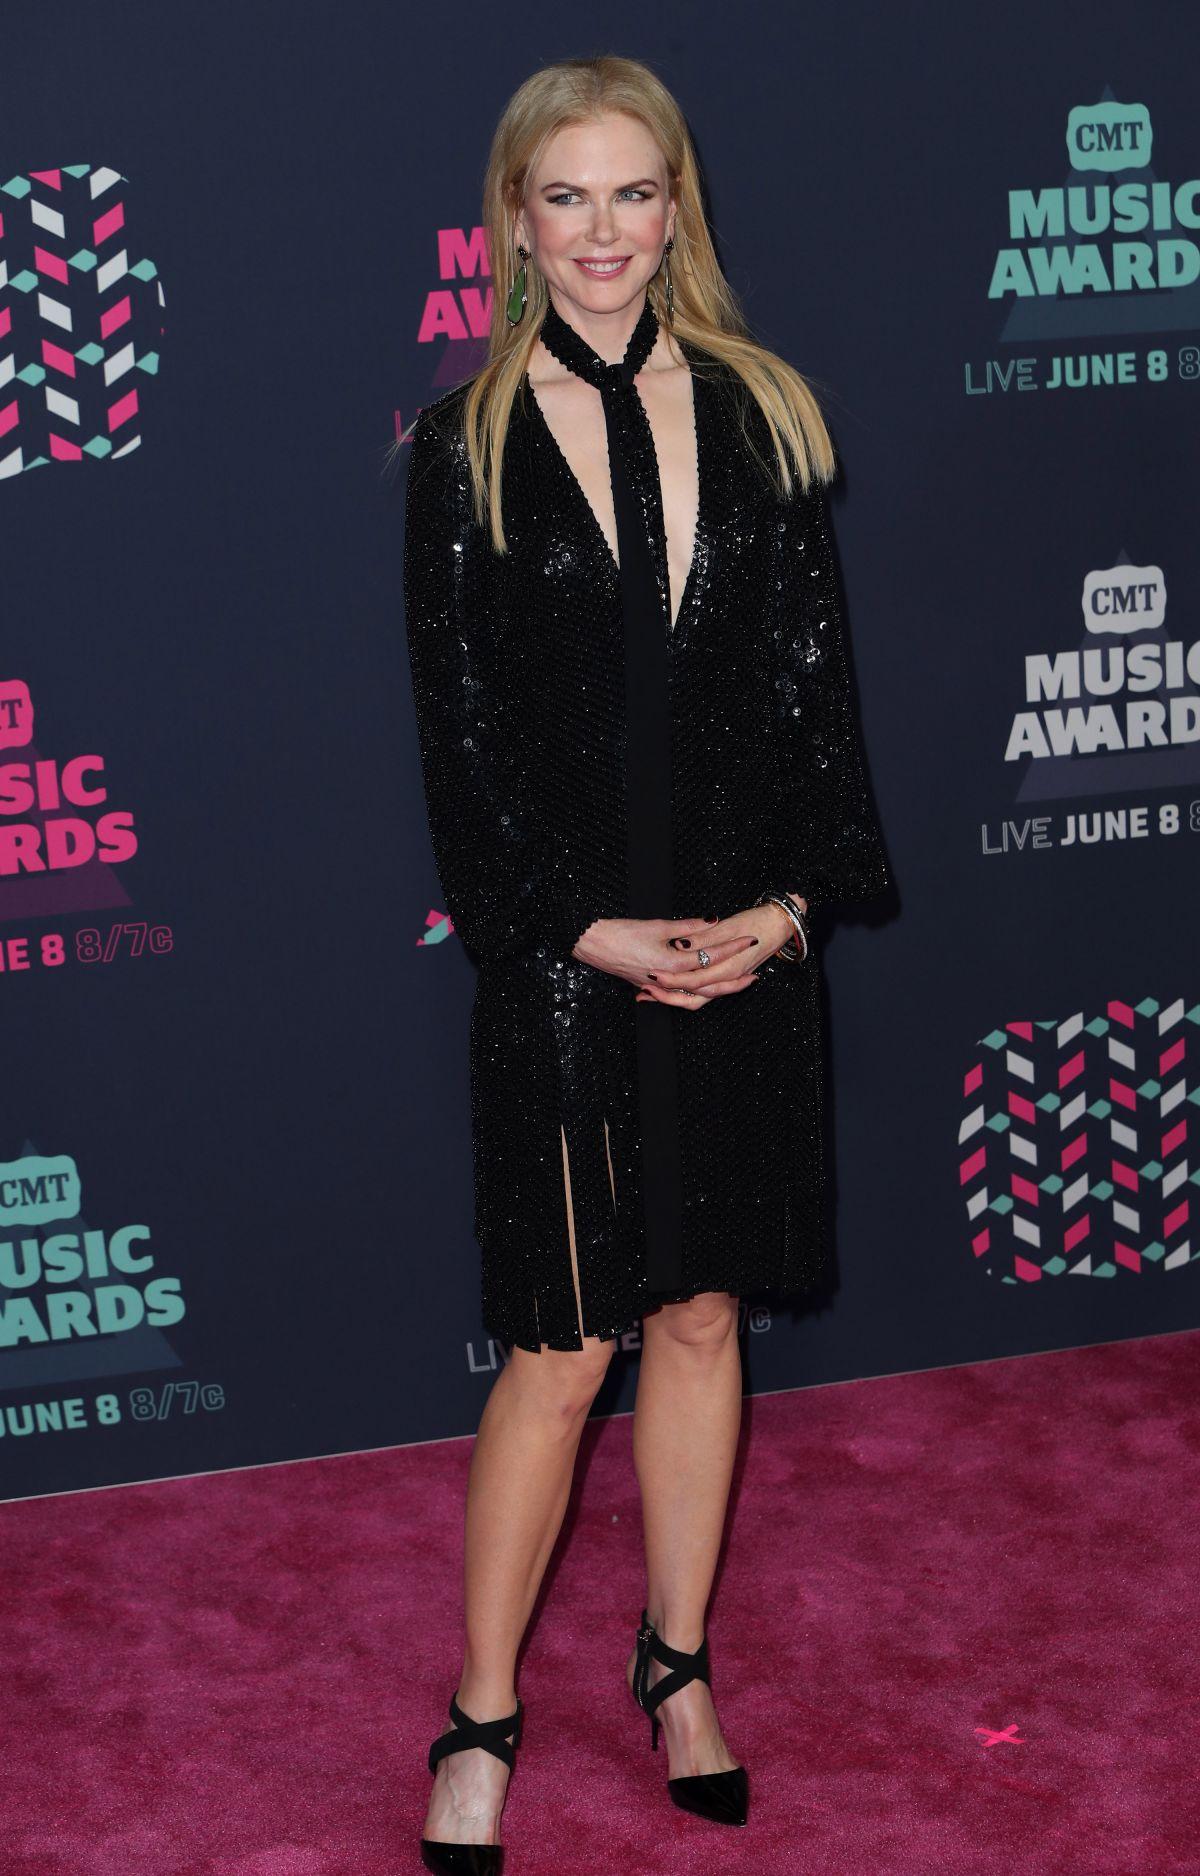 NICOLE KIDMAN at 2016 CMT Music Awards in Nashville 06/08/2016